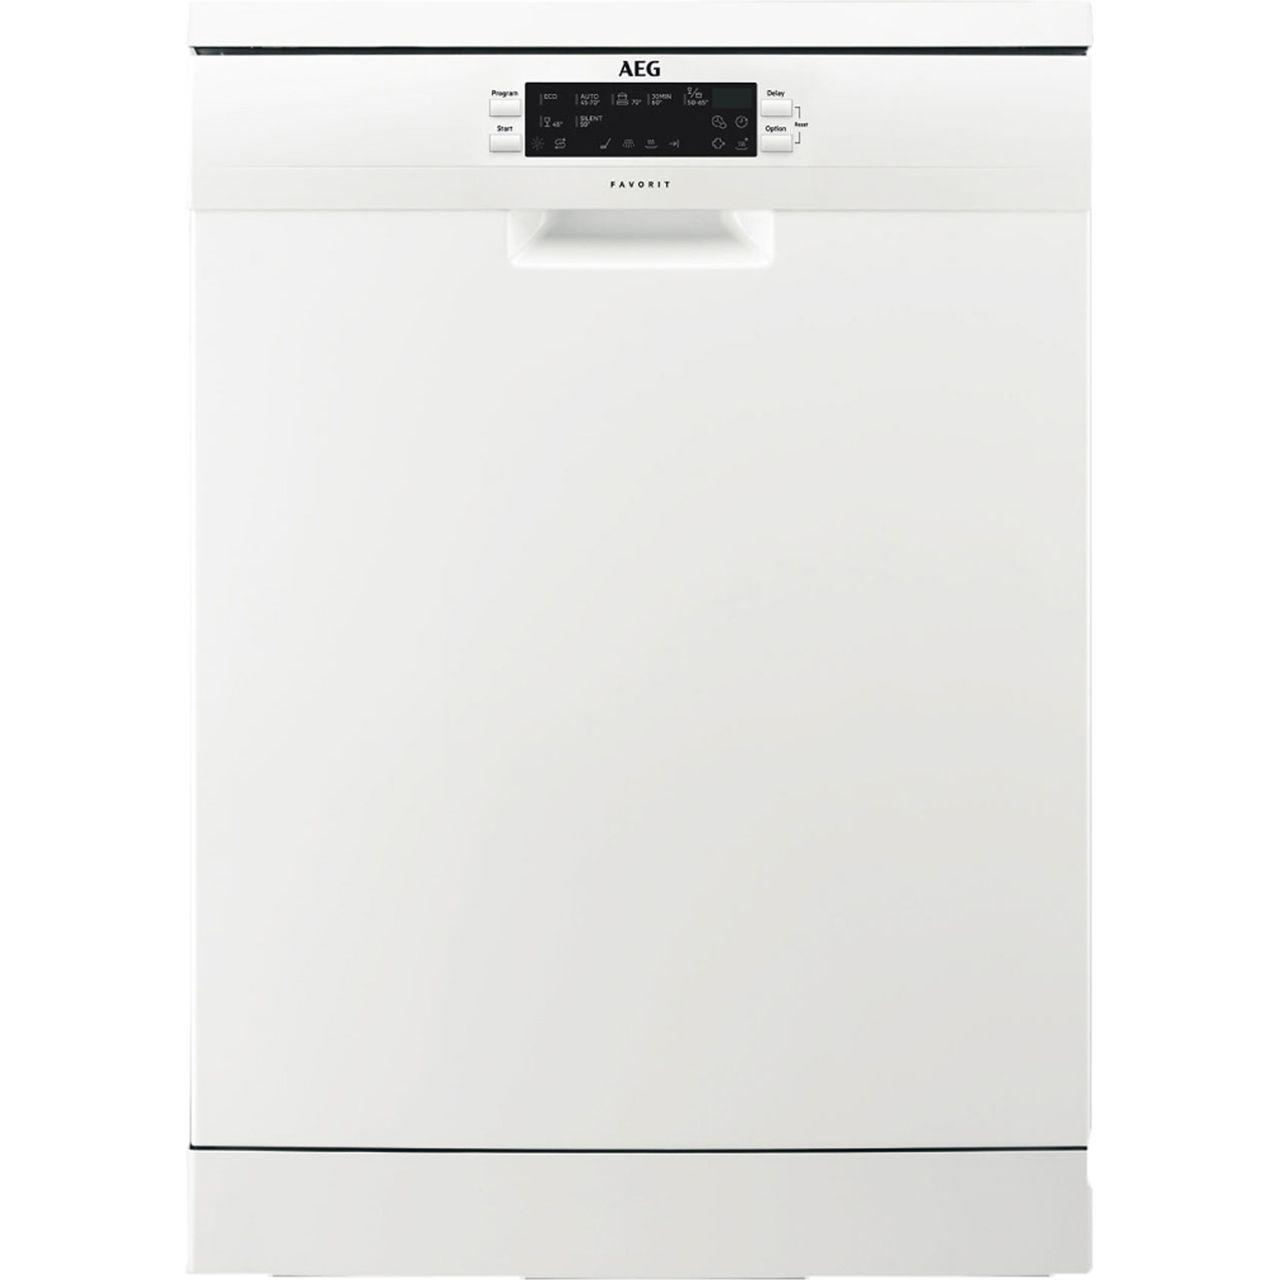 Ffe63700pw Wh Aeg Dishwasher White Ao Com